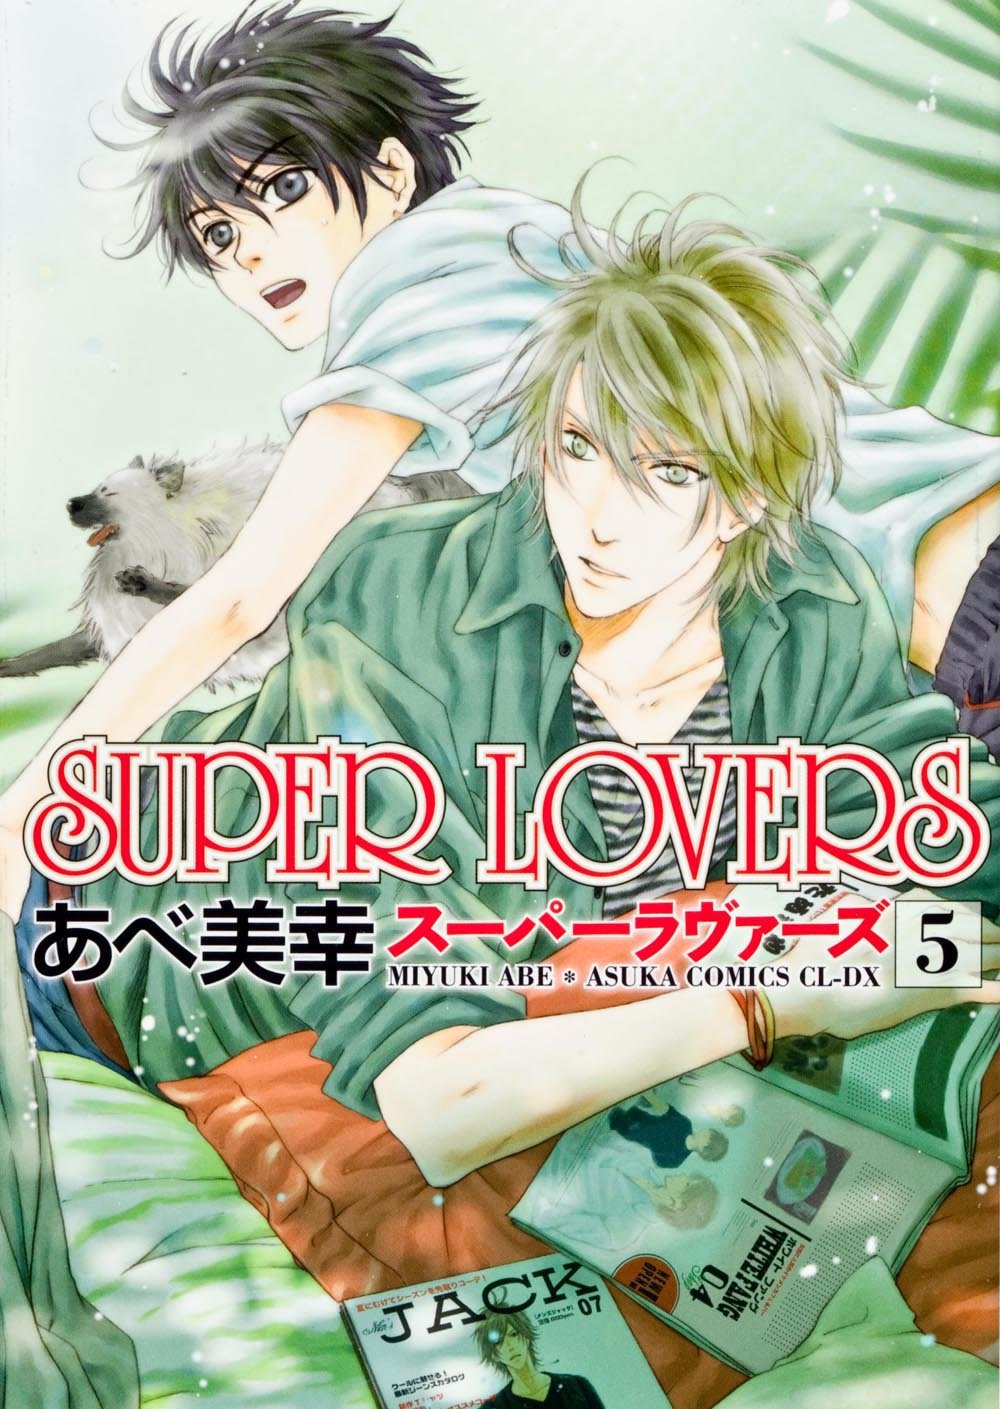 Volume 5 SUPER LOVERS (Asuka Comics CL-DX) (2012) ISBN: 4041203880 [Japanese Import] ebook